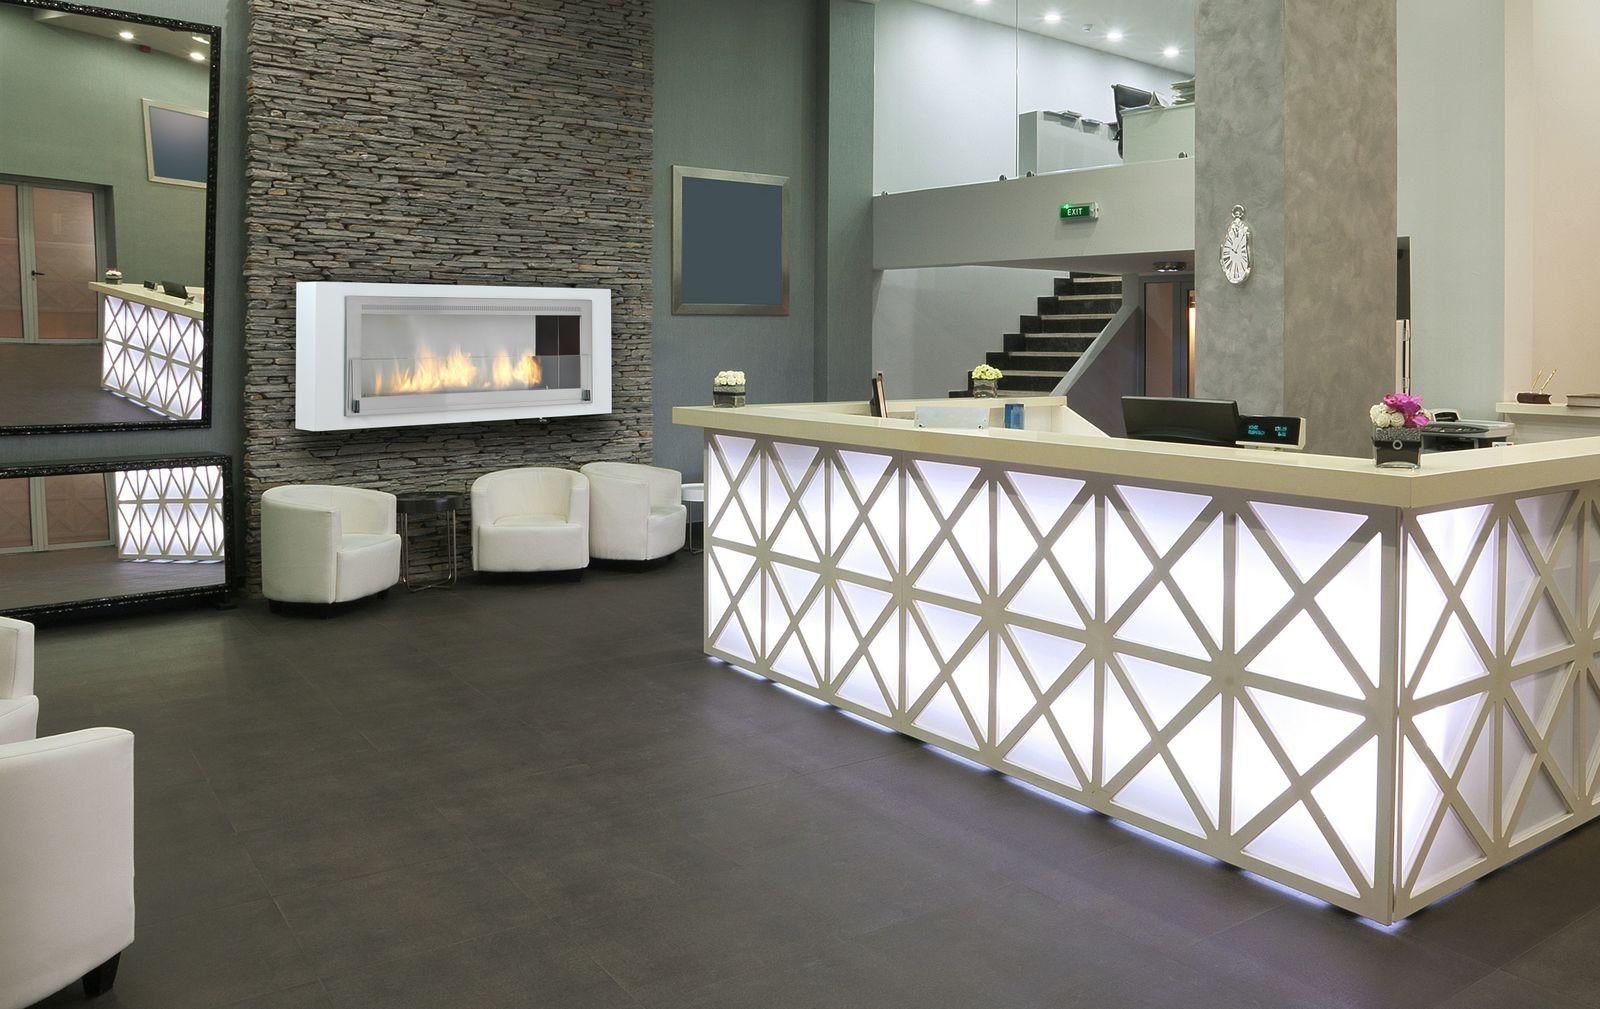 Fake Fireplace Logs Battery Operated Fireplace Design Ideas Ethanol Fireplace Modern Fireplace Fireplace Built Ins